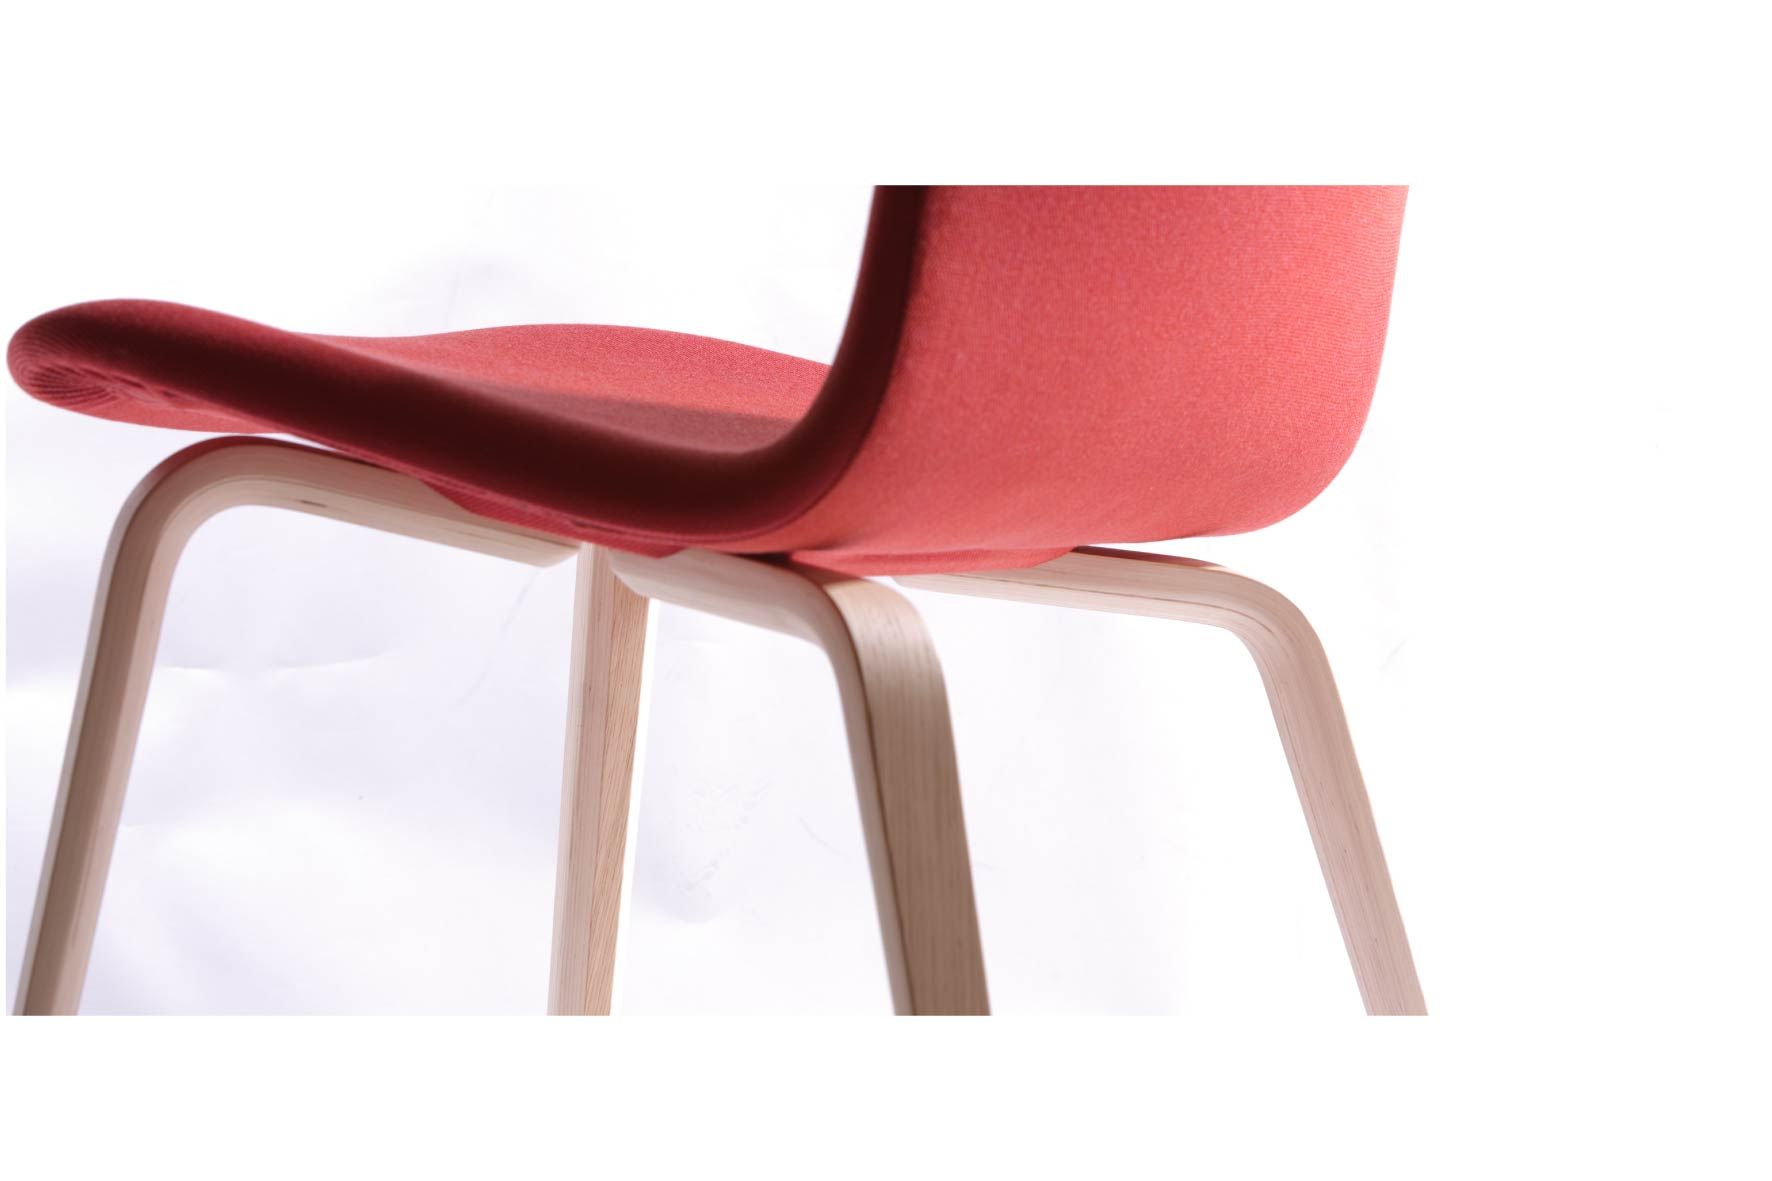 Dižozols bent wood design chairs (10)